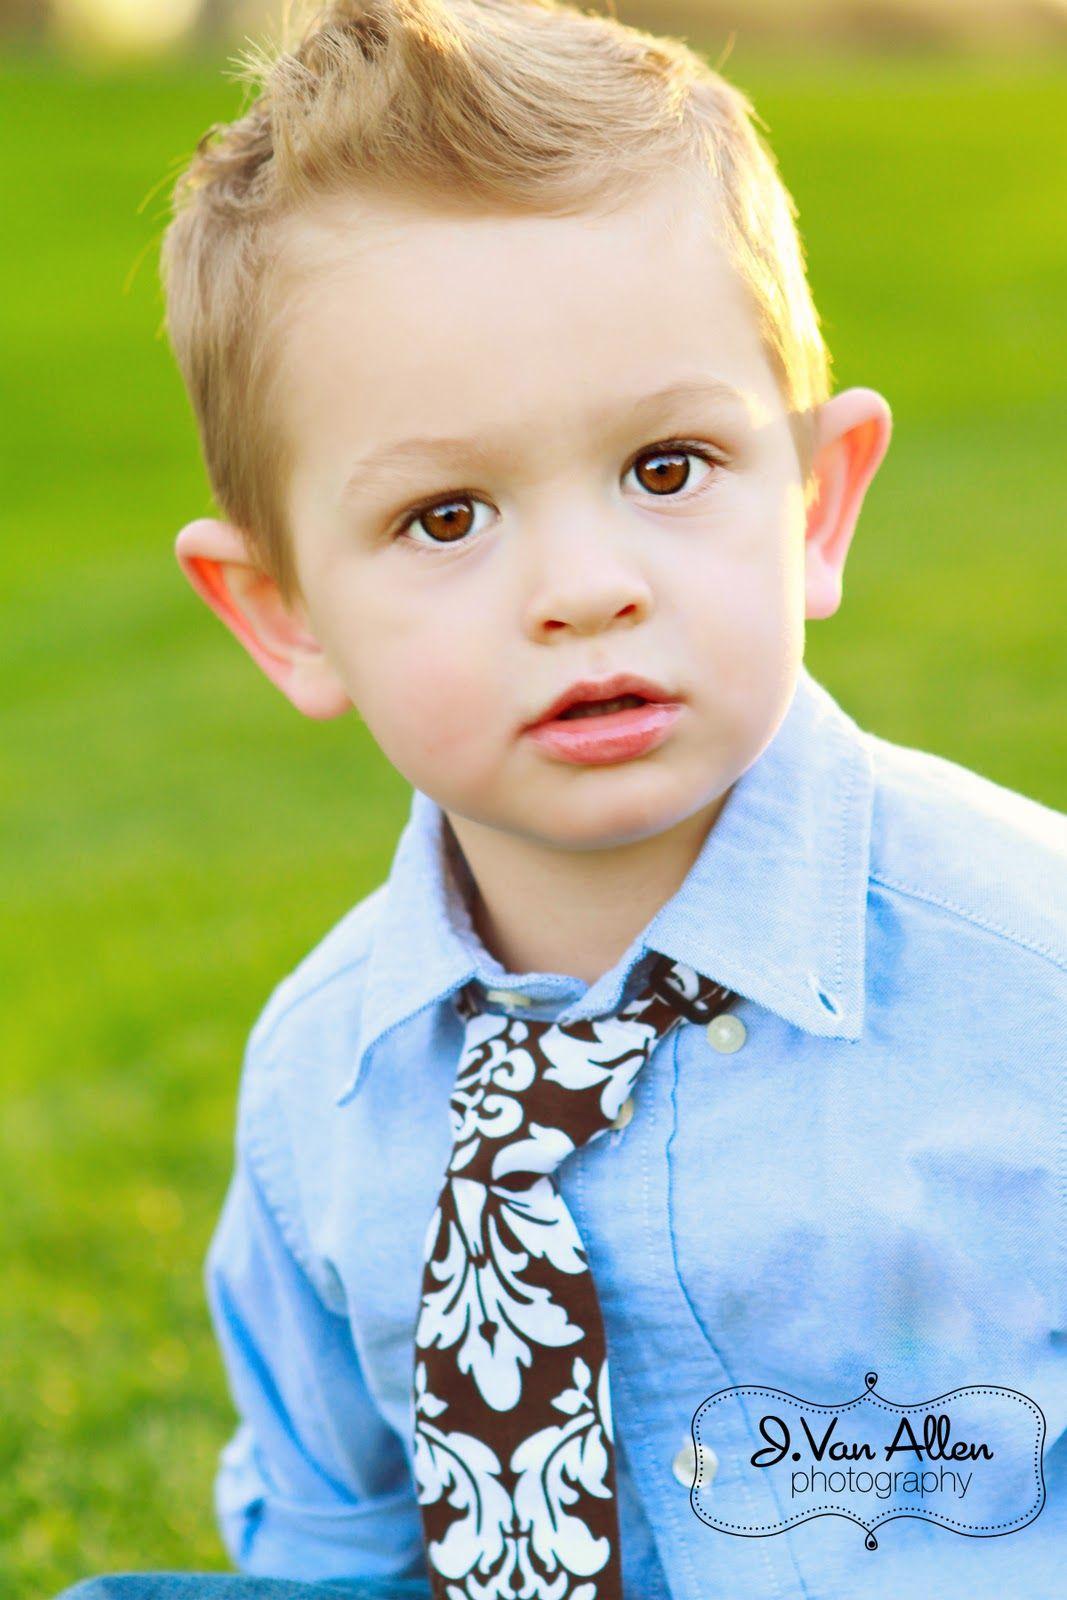 Cute Baby Boy Wallpaper Photo